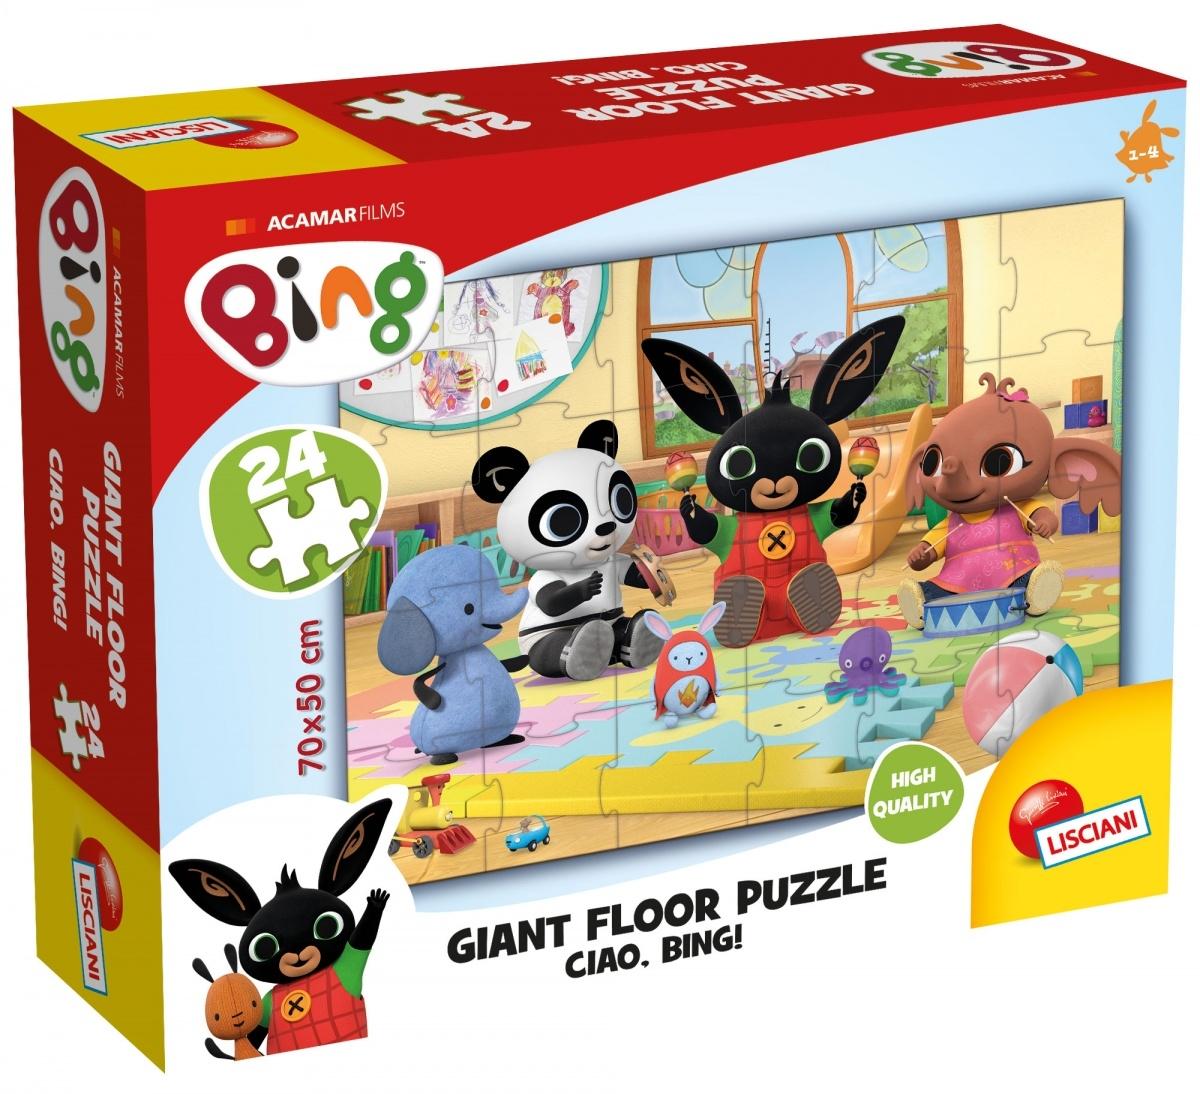 Bing - Ogromne puzzle podłogowe (304-74716)